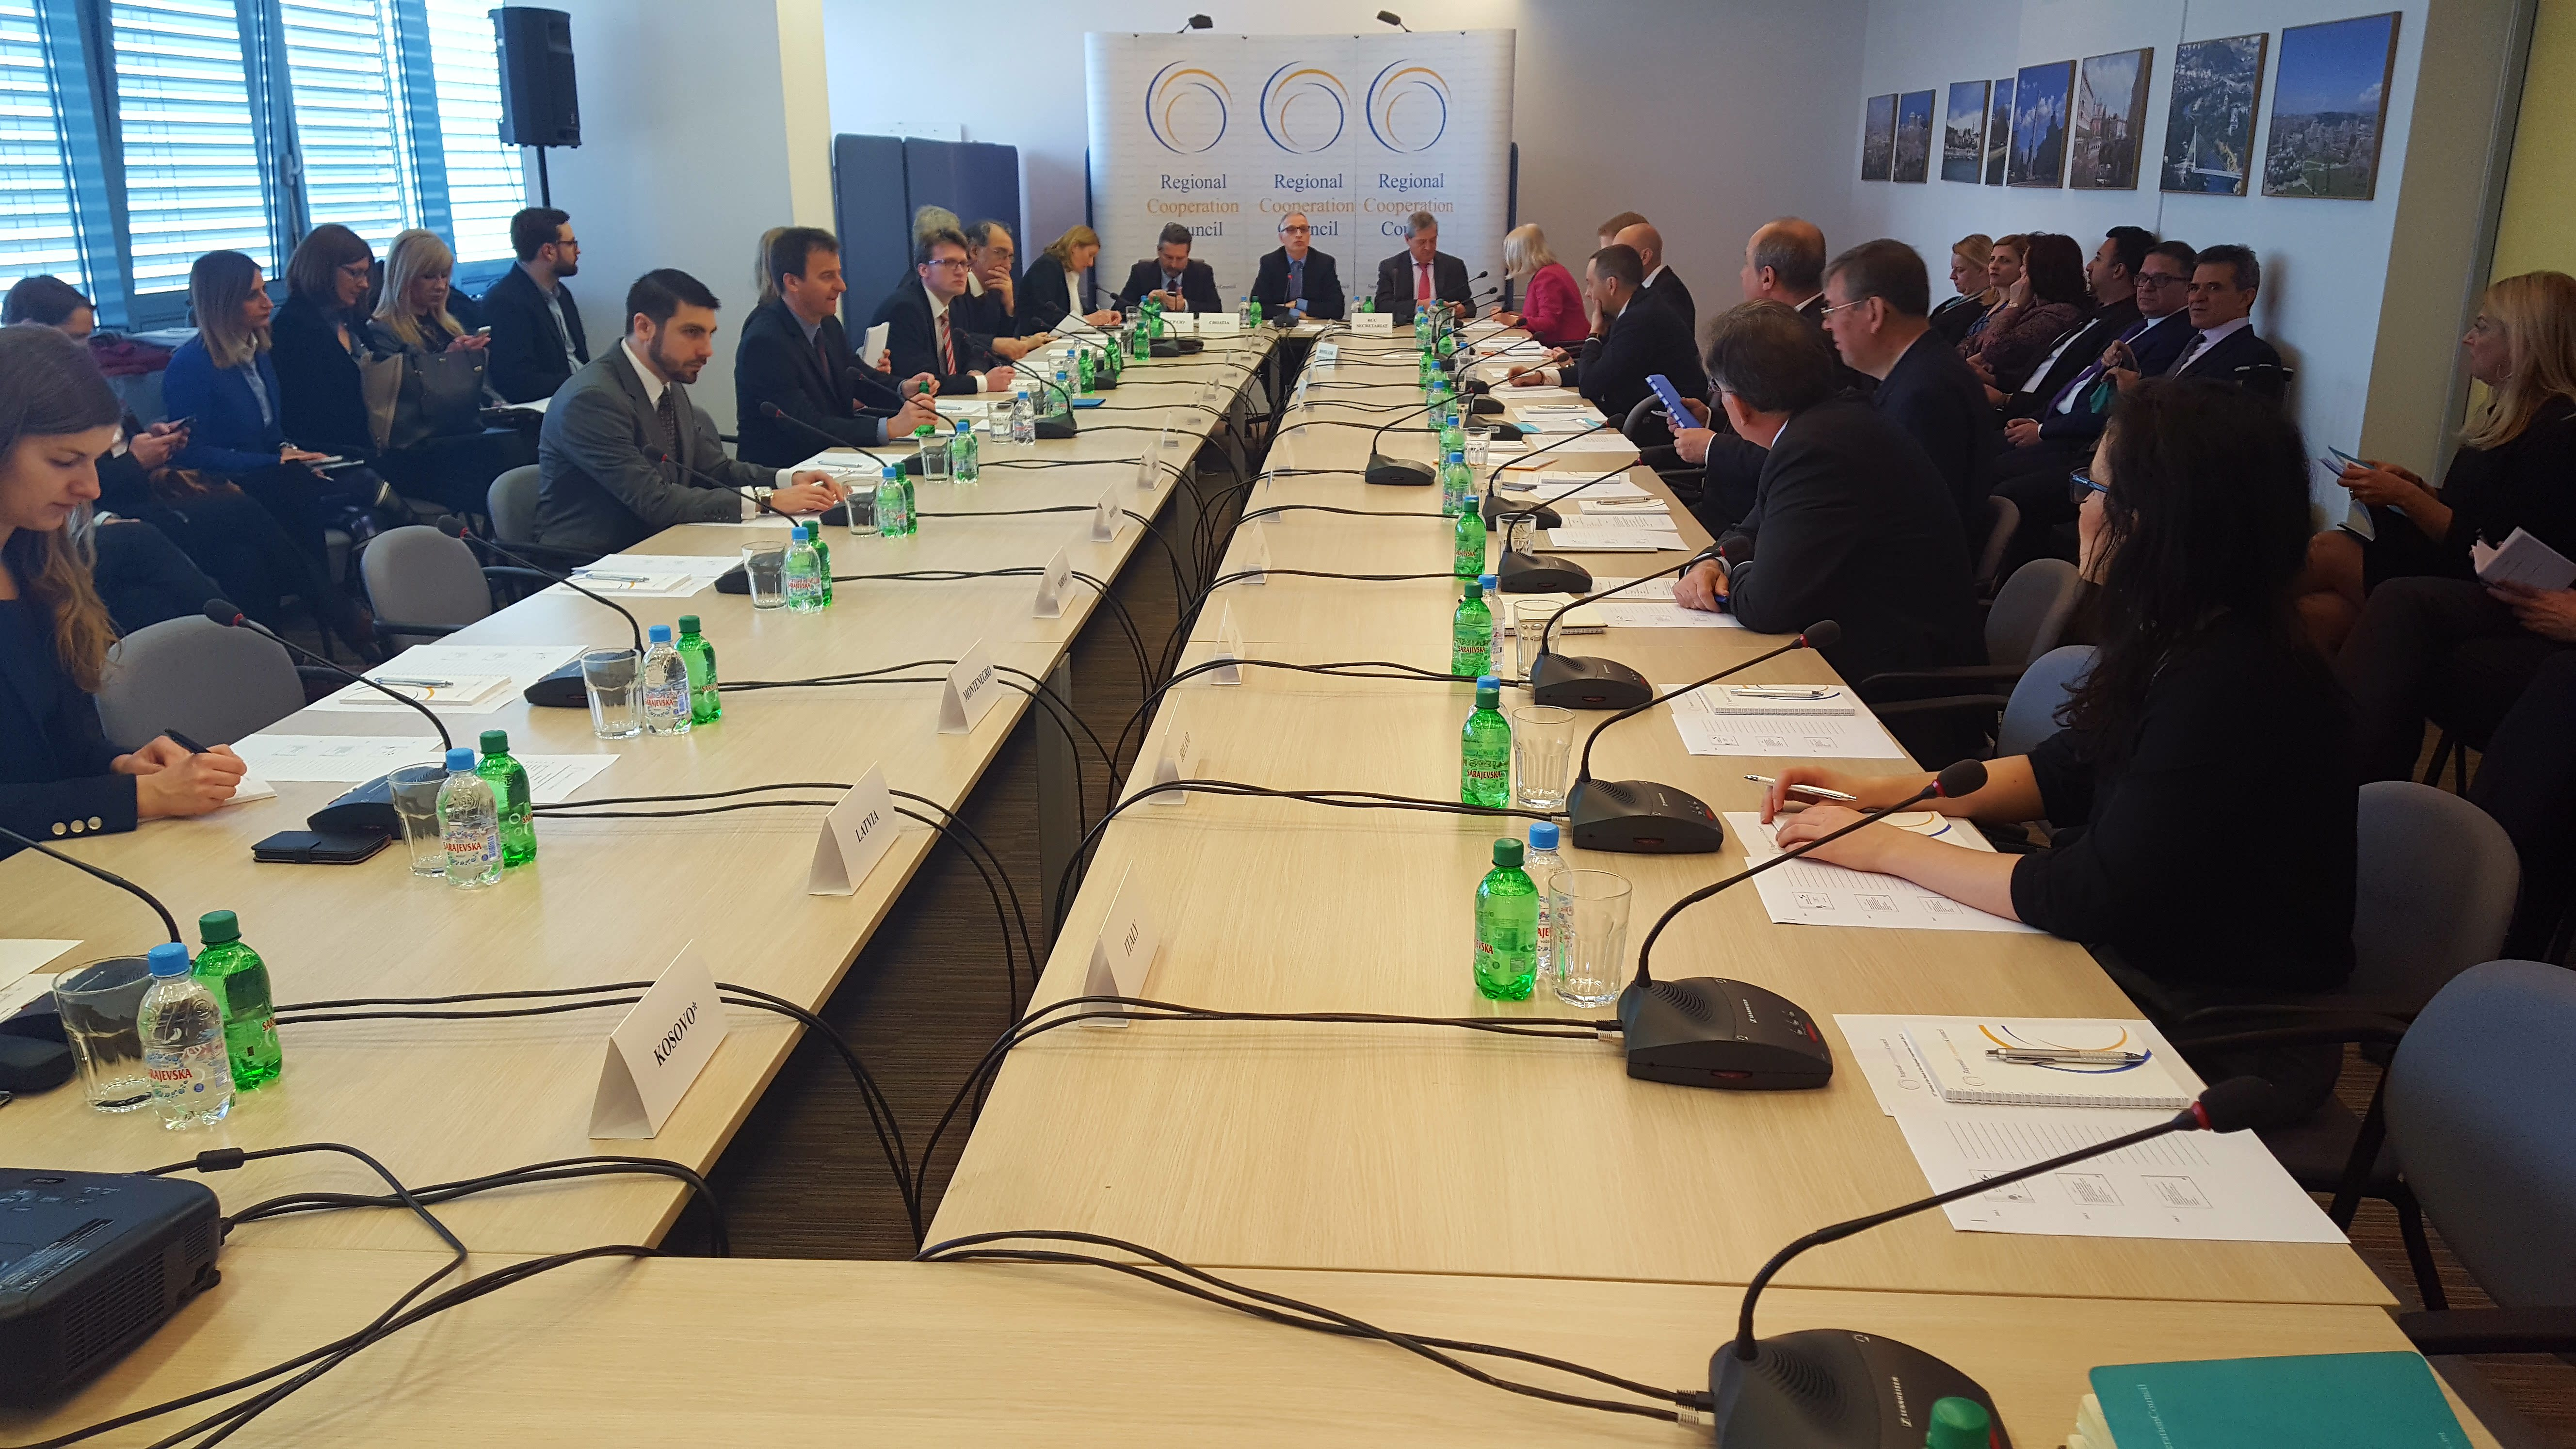 31st meeting of the RCC Board, on 15 March 2017 in Sarajevo, BiH. (Photo: RCC/Selma Ahatovic-Lihic)